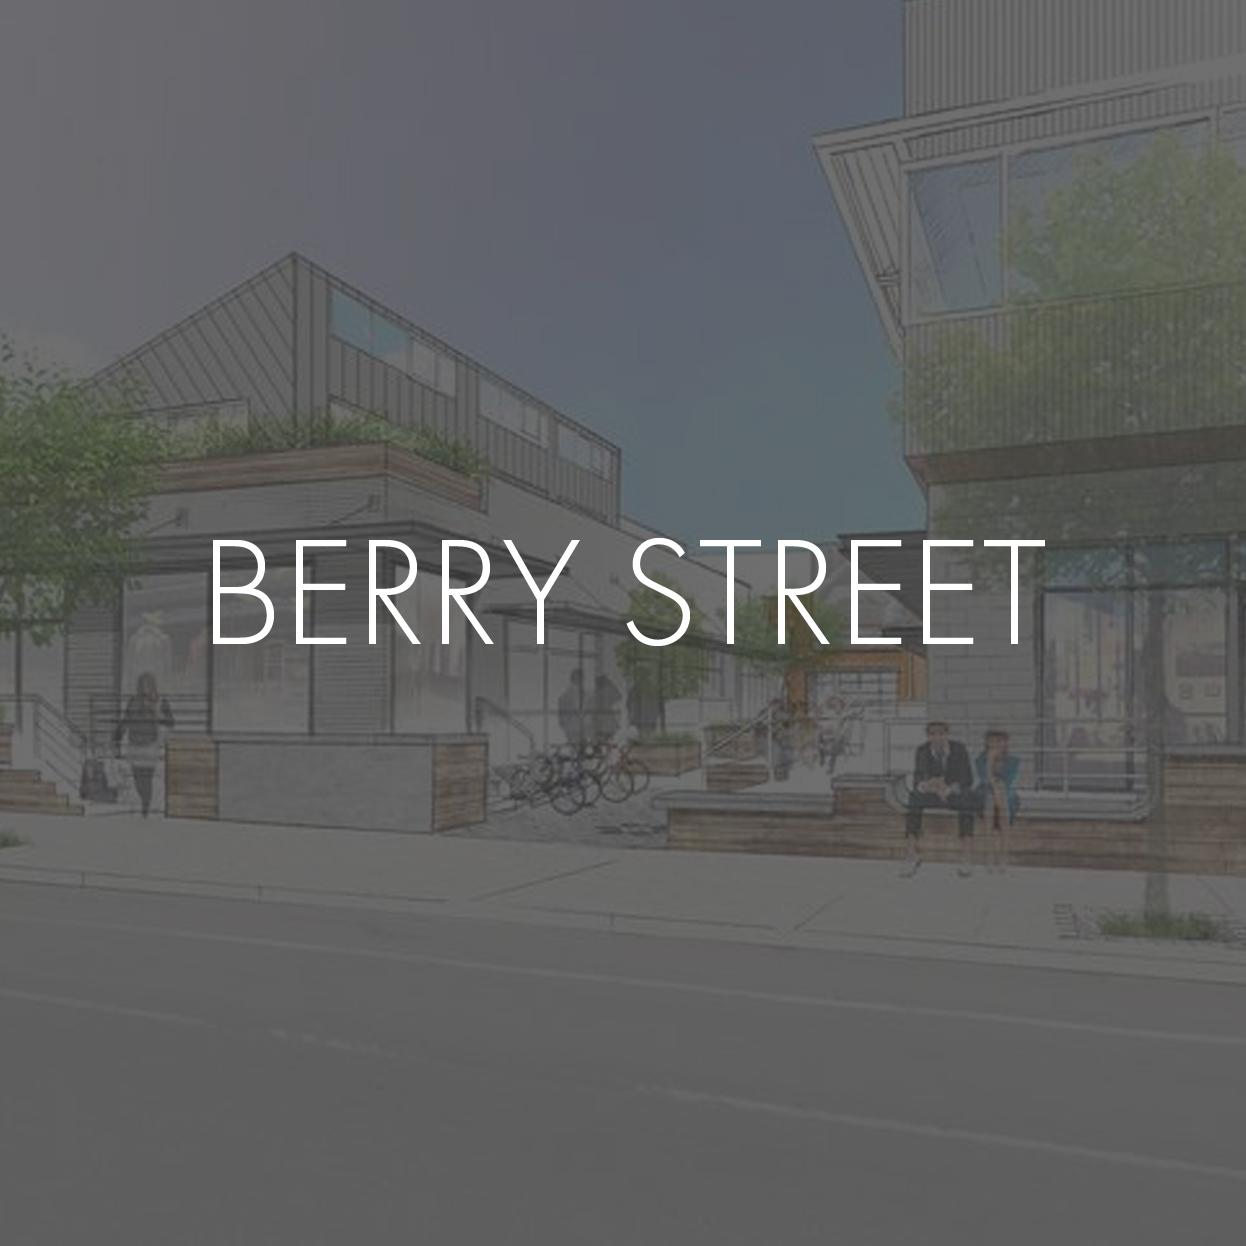 02_THUMBNAIL BERRY STREET.jpg